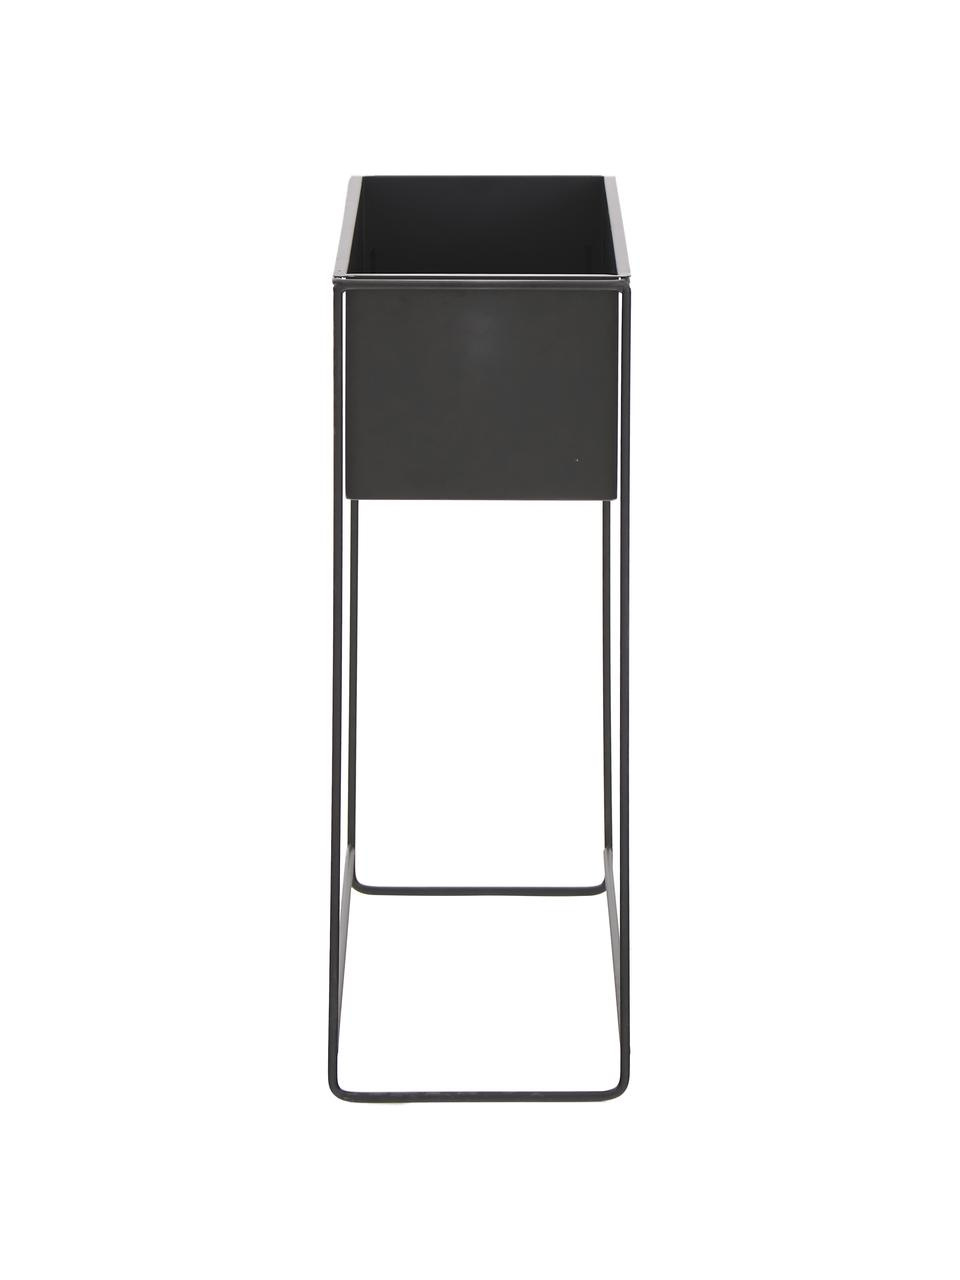 Portavaso in metallo Flina, Metallo rivestito, Nero, Larg. 51 x Alt. 65 cm